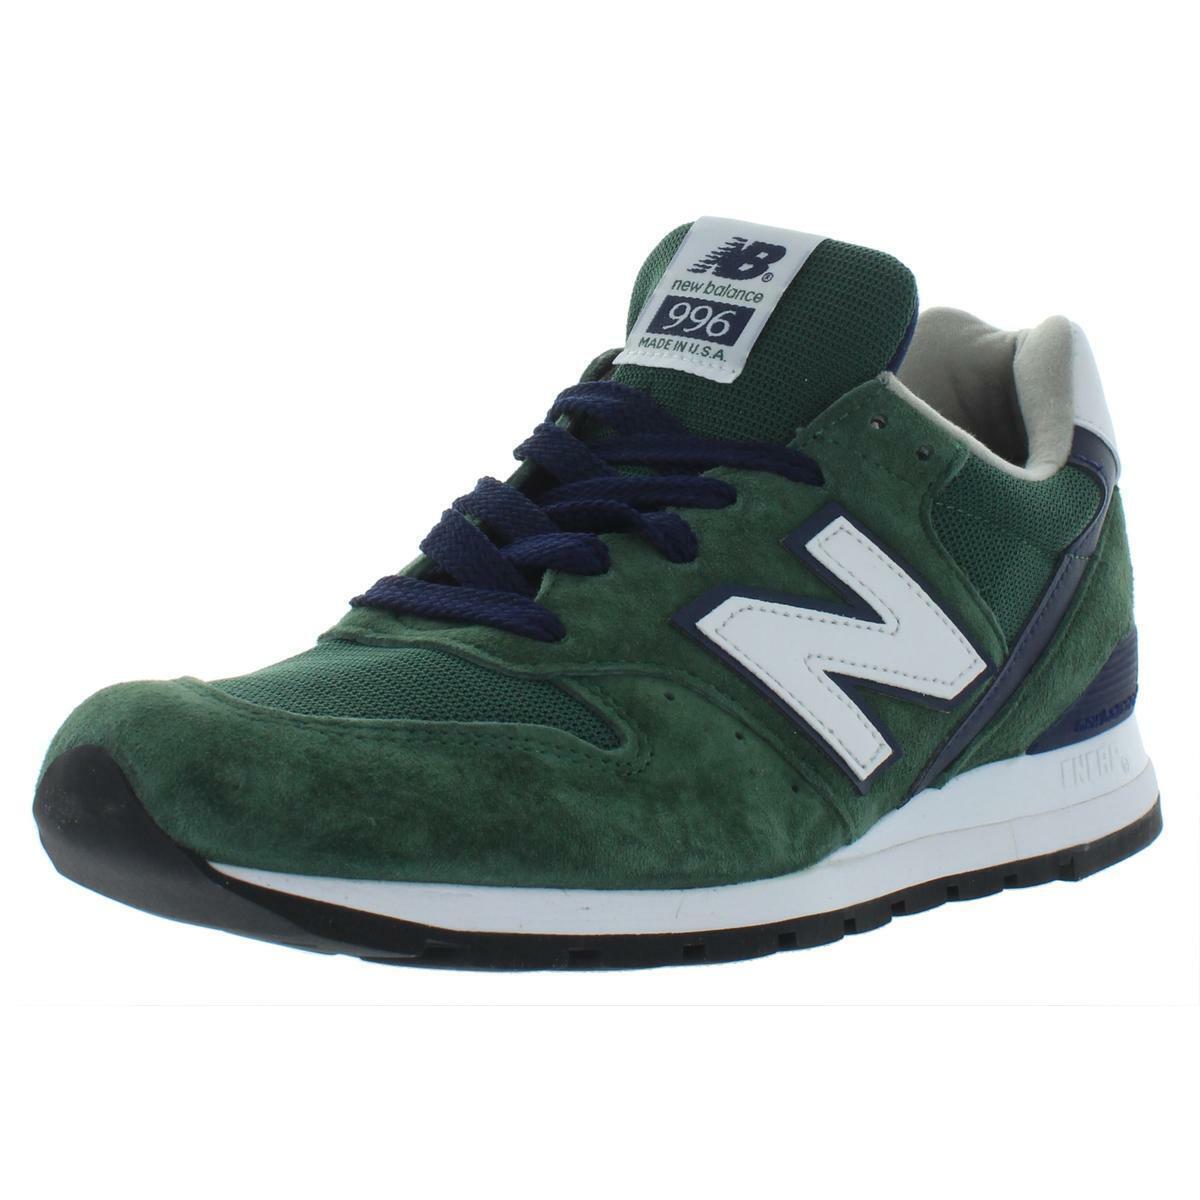 New Balance Mens verde Low Top Casual scarpe da ginnastica scarpe 9 Medium (D) BHFO 9850